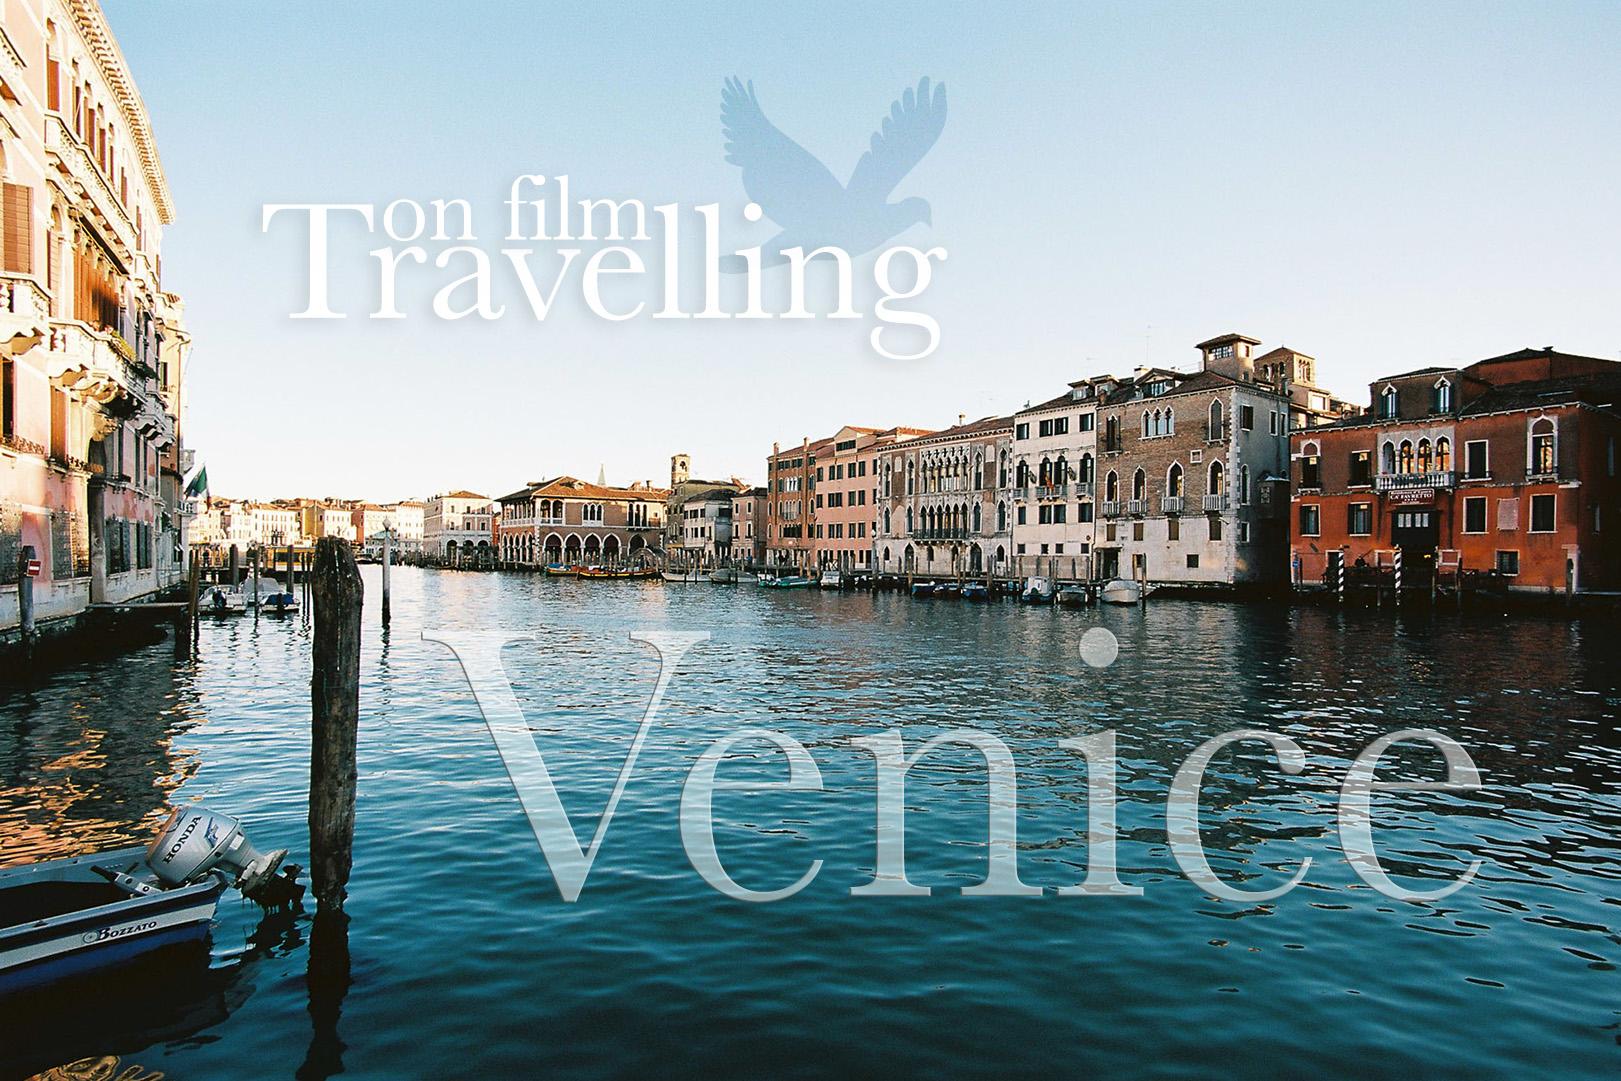 Venice kodak Ektar 100 Vista400 analog film photography